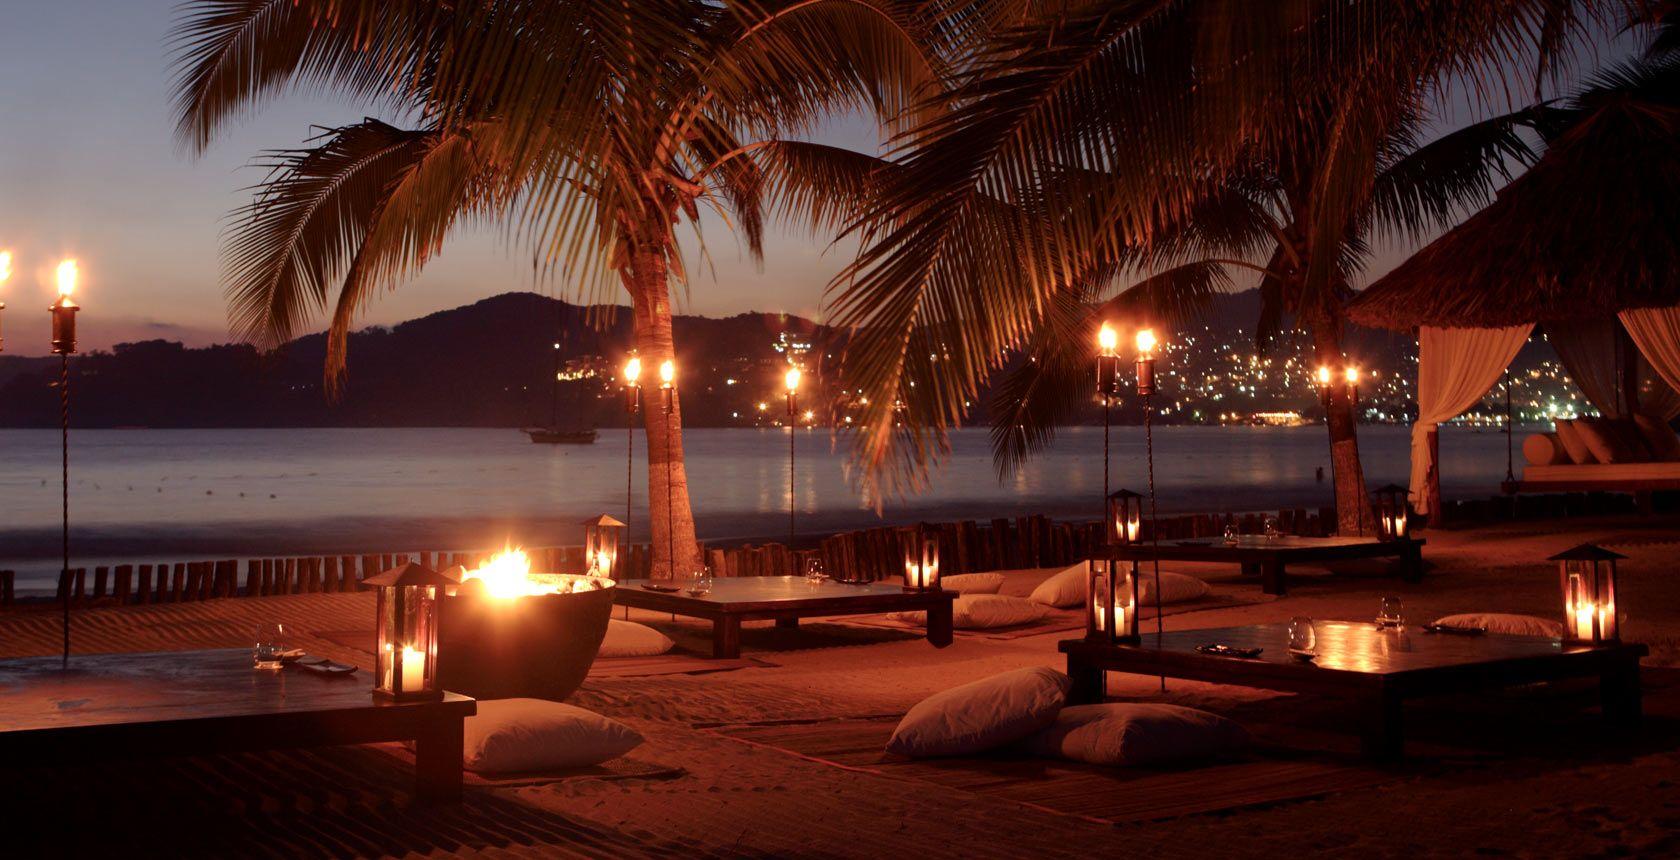 zihuatanejo villas | luxury mexico resort | viceroy zihuatanejo